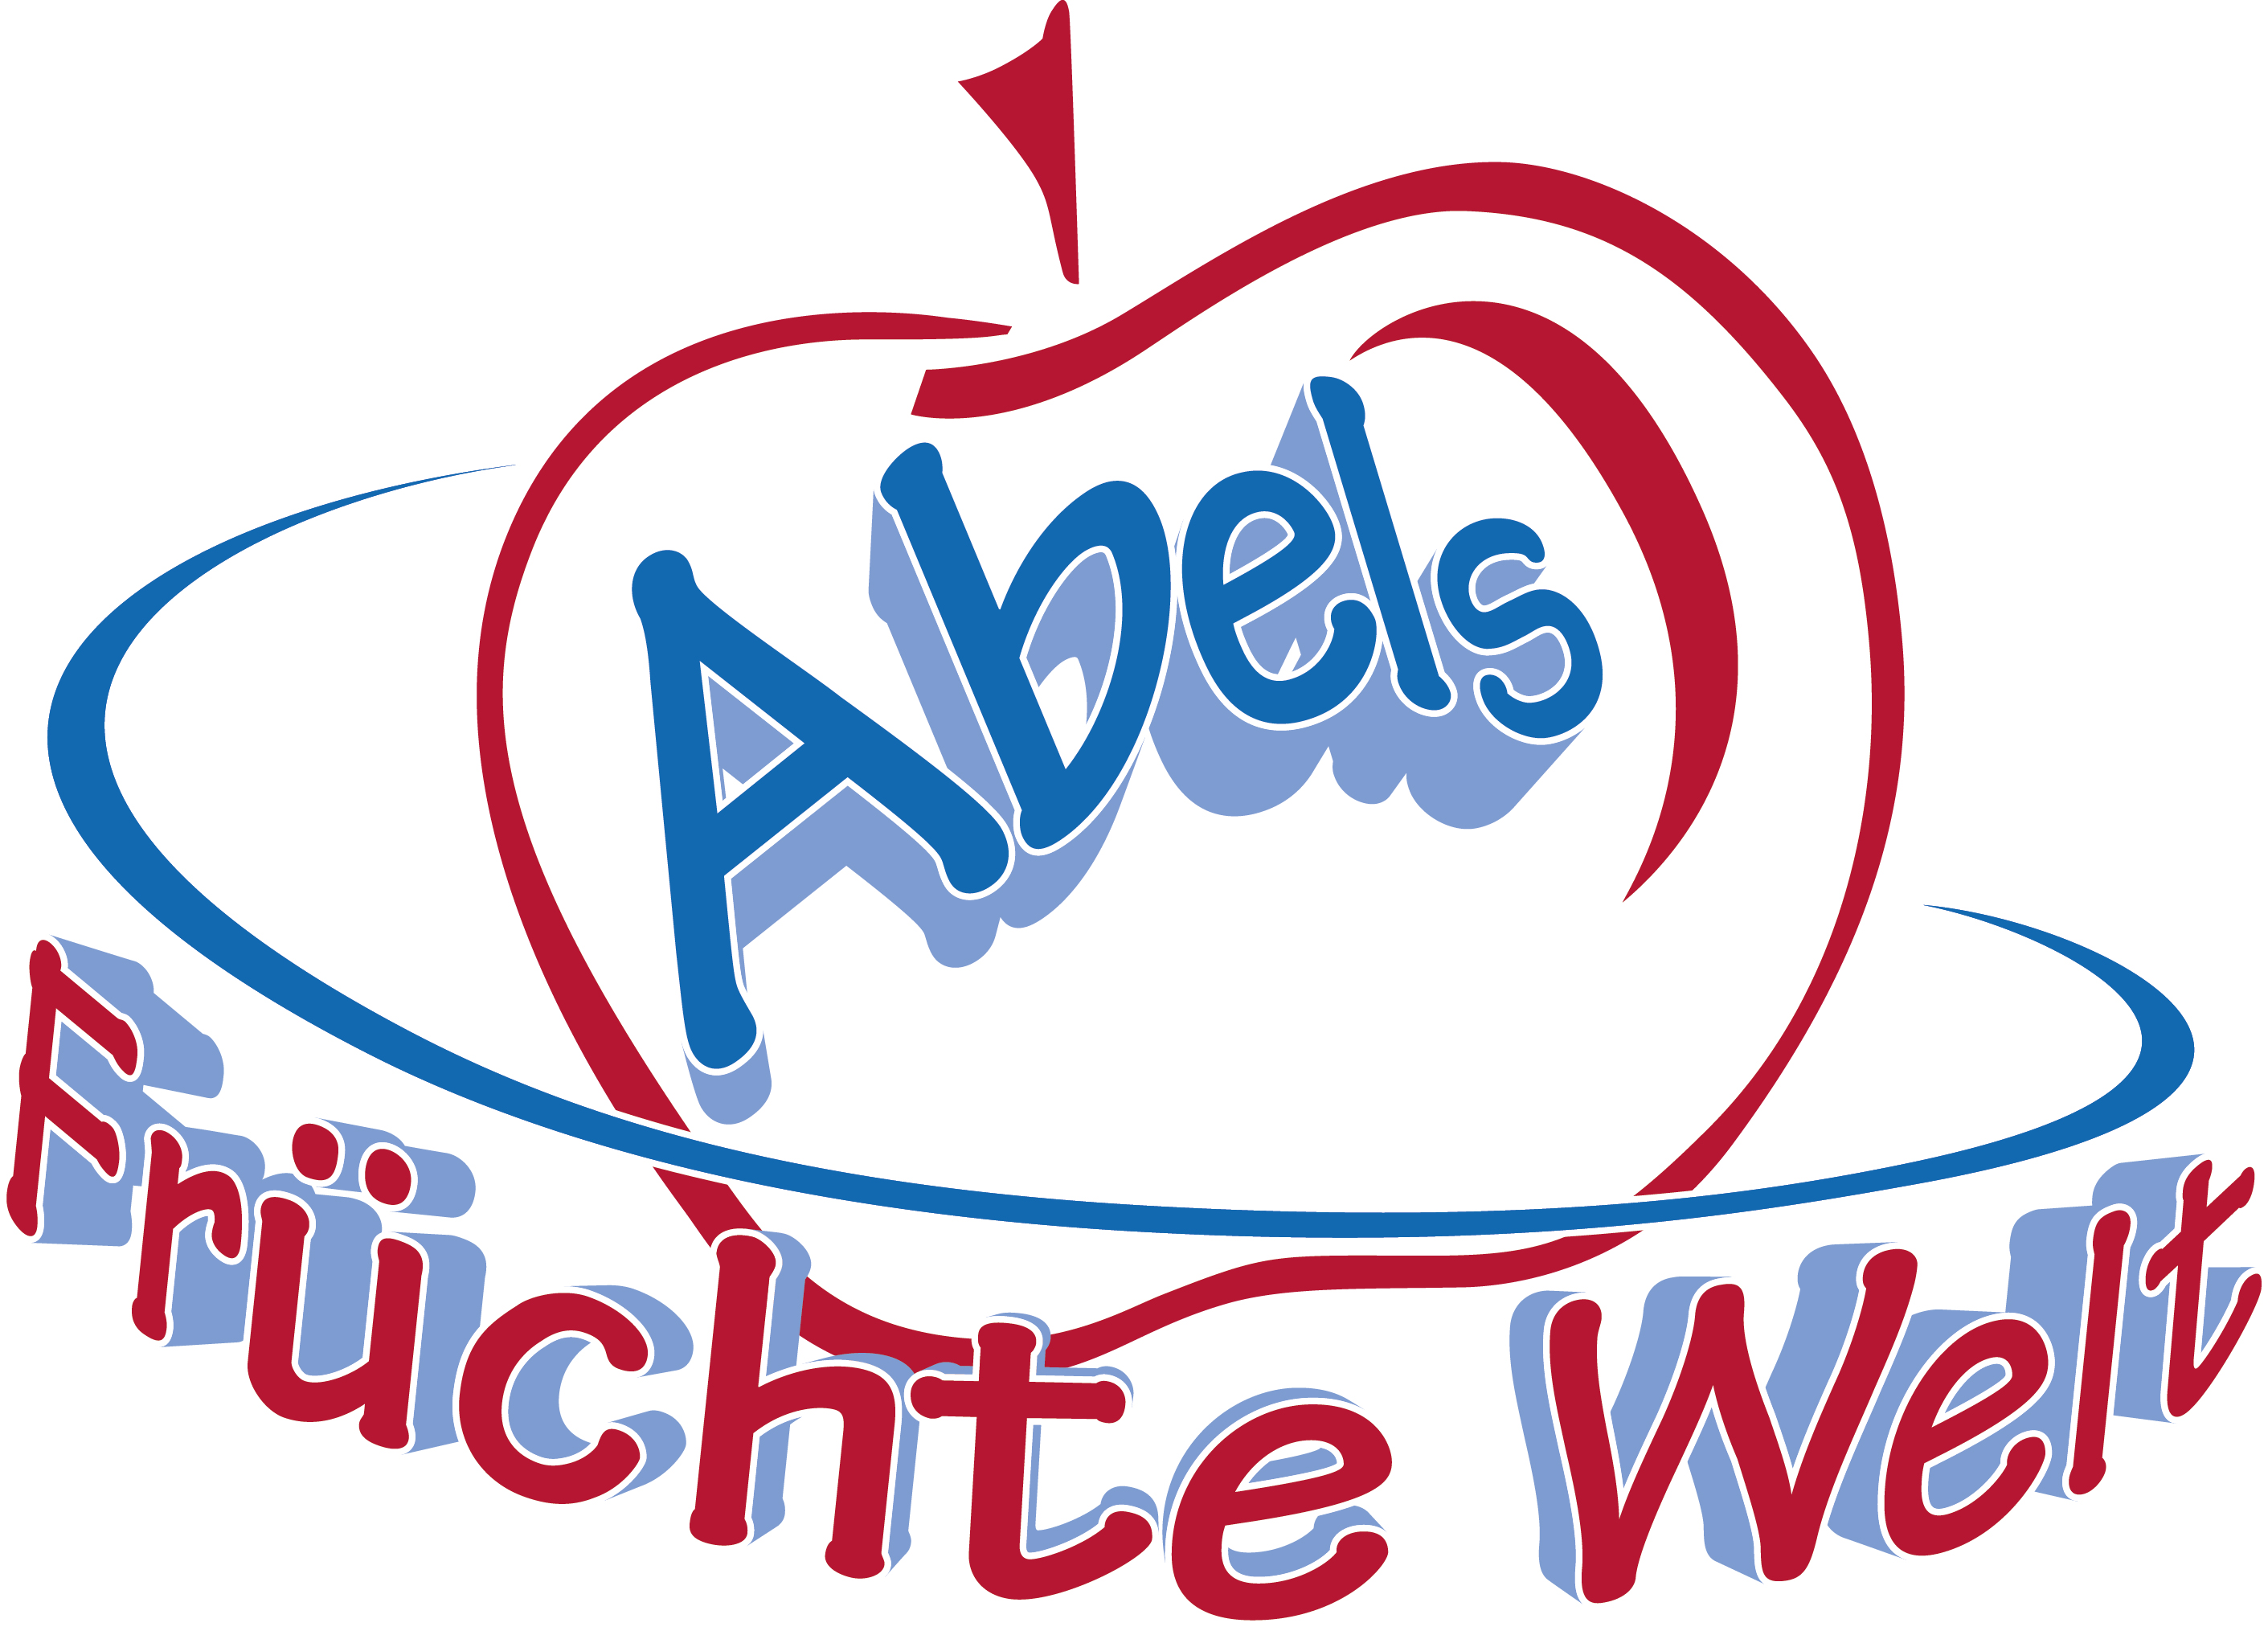 Abels Fruechte Welt